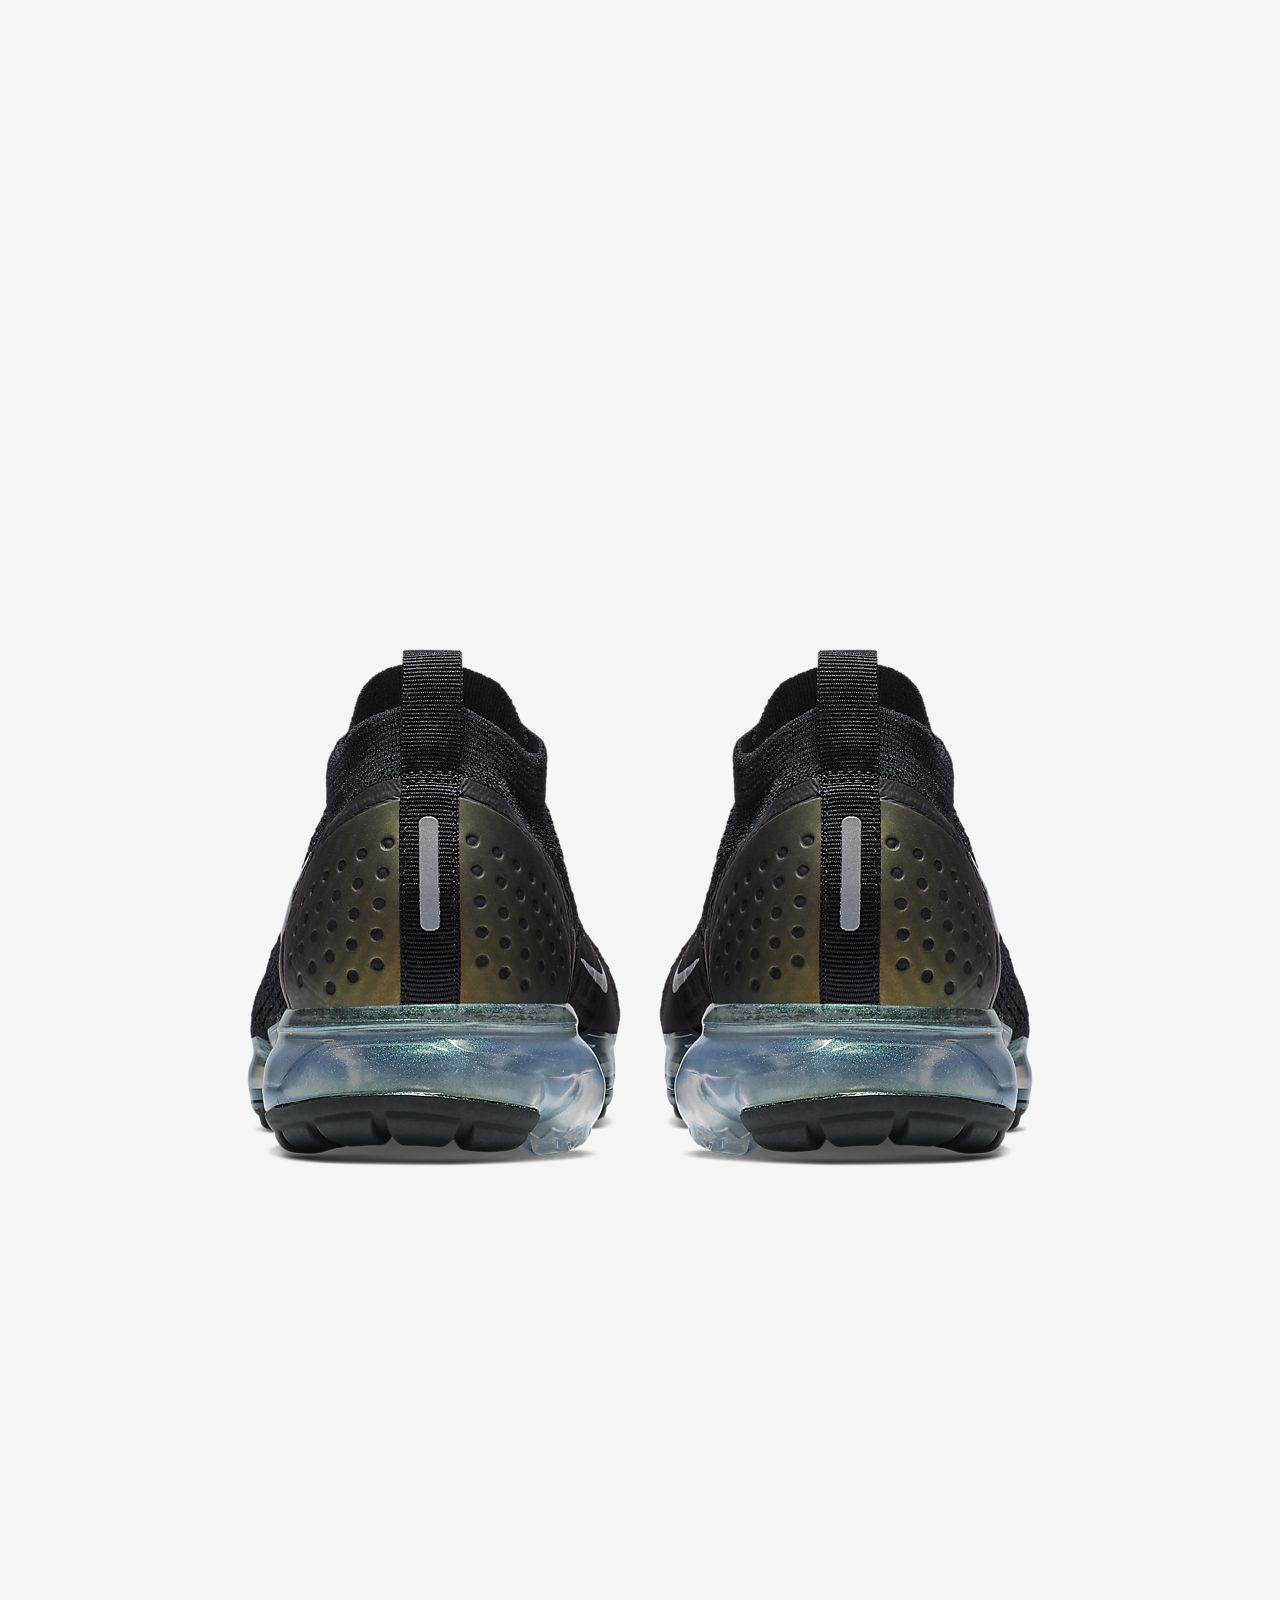 quality design 1ab67 66d05 ... Sko Nike Air VaporMax Flyknit 2